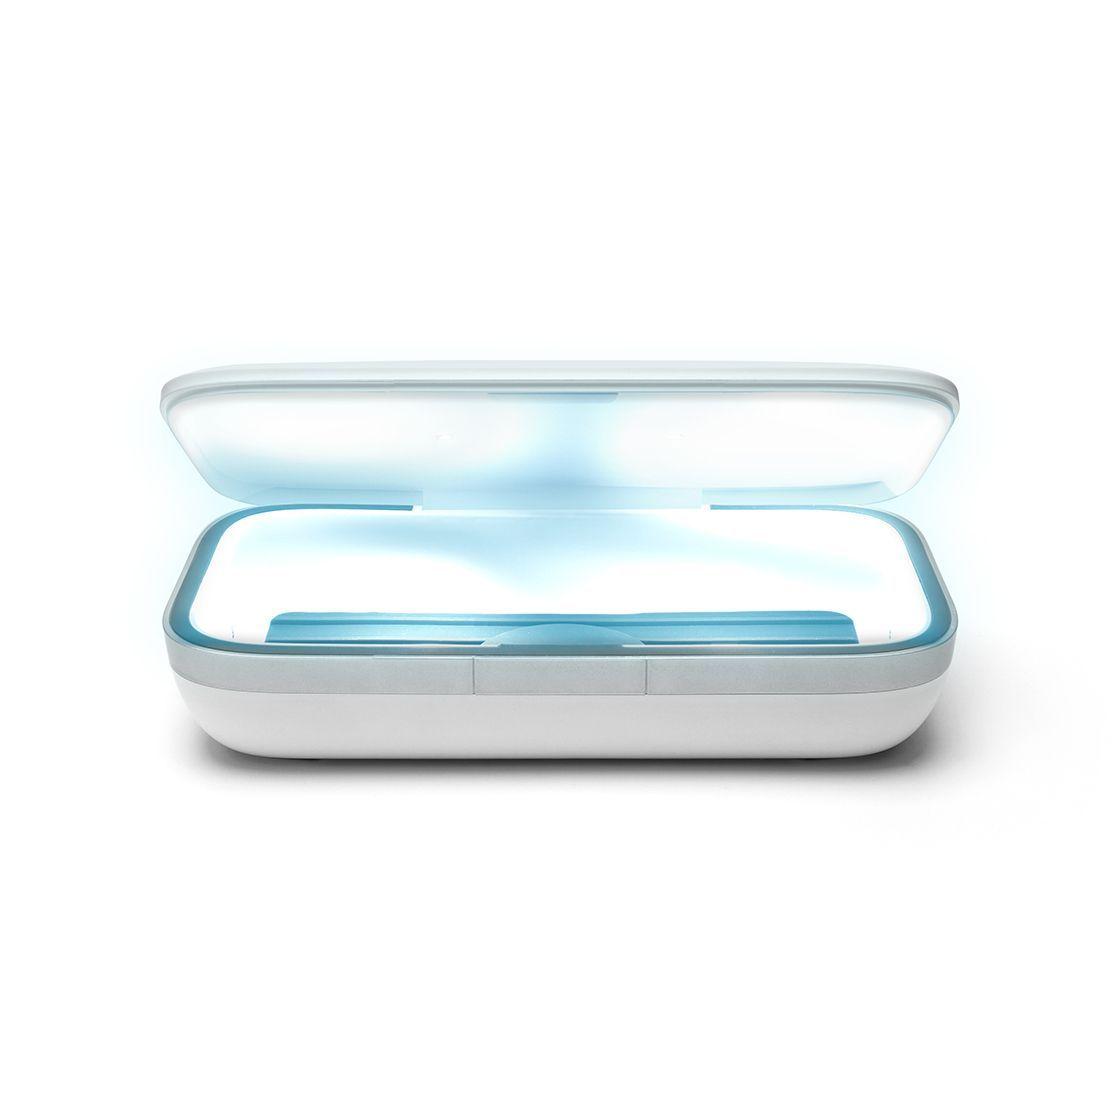 UV Sanitizer CASETiFY in 2020 Clean phone, Sanitizer